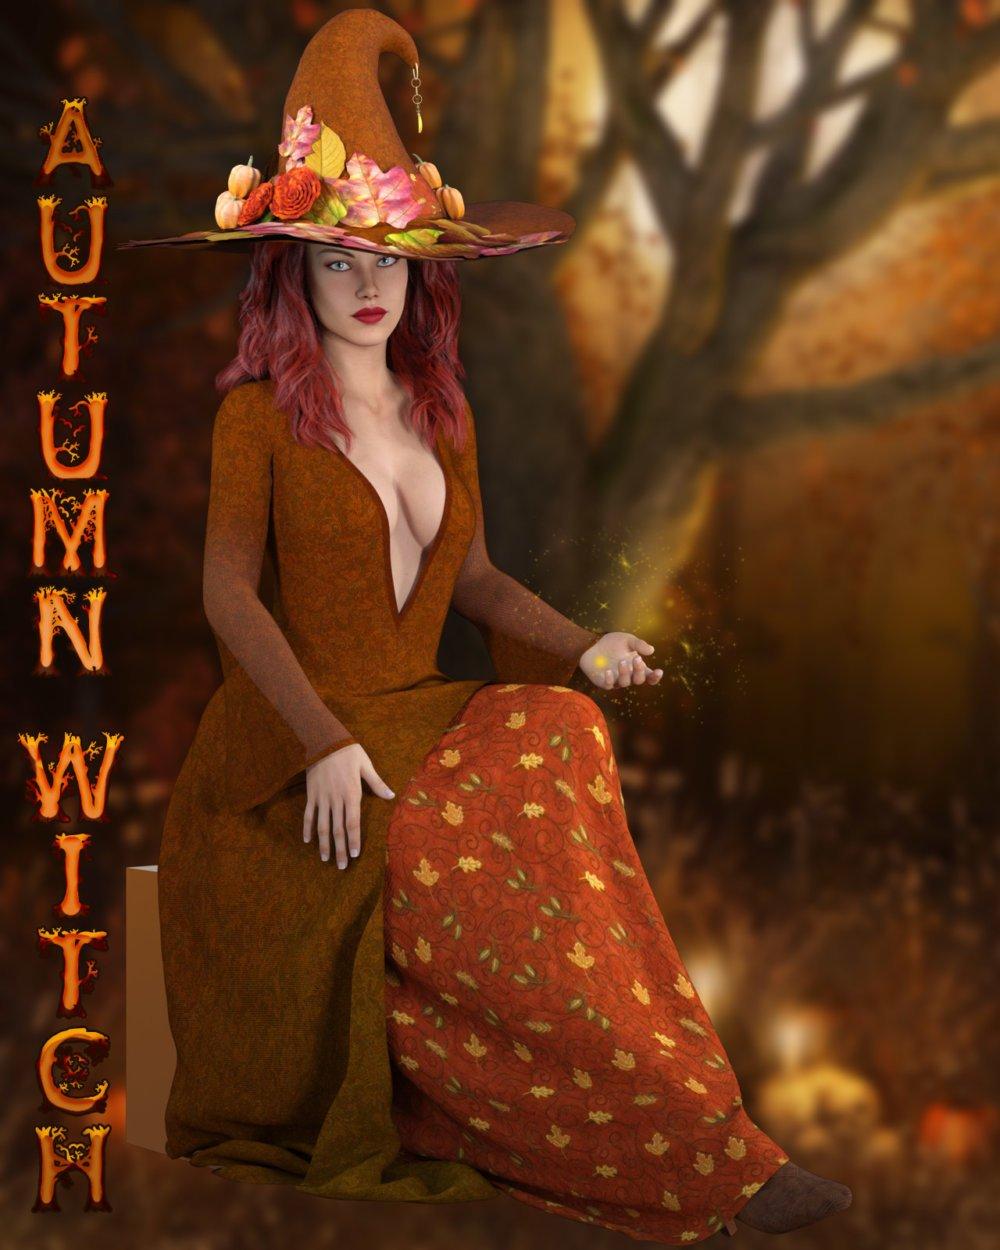 dforce - Autumn Witch Genesis 8